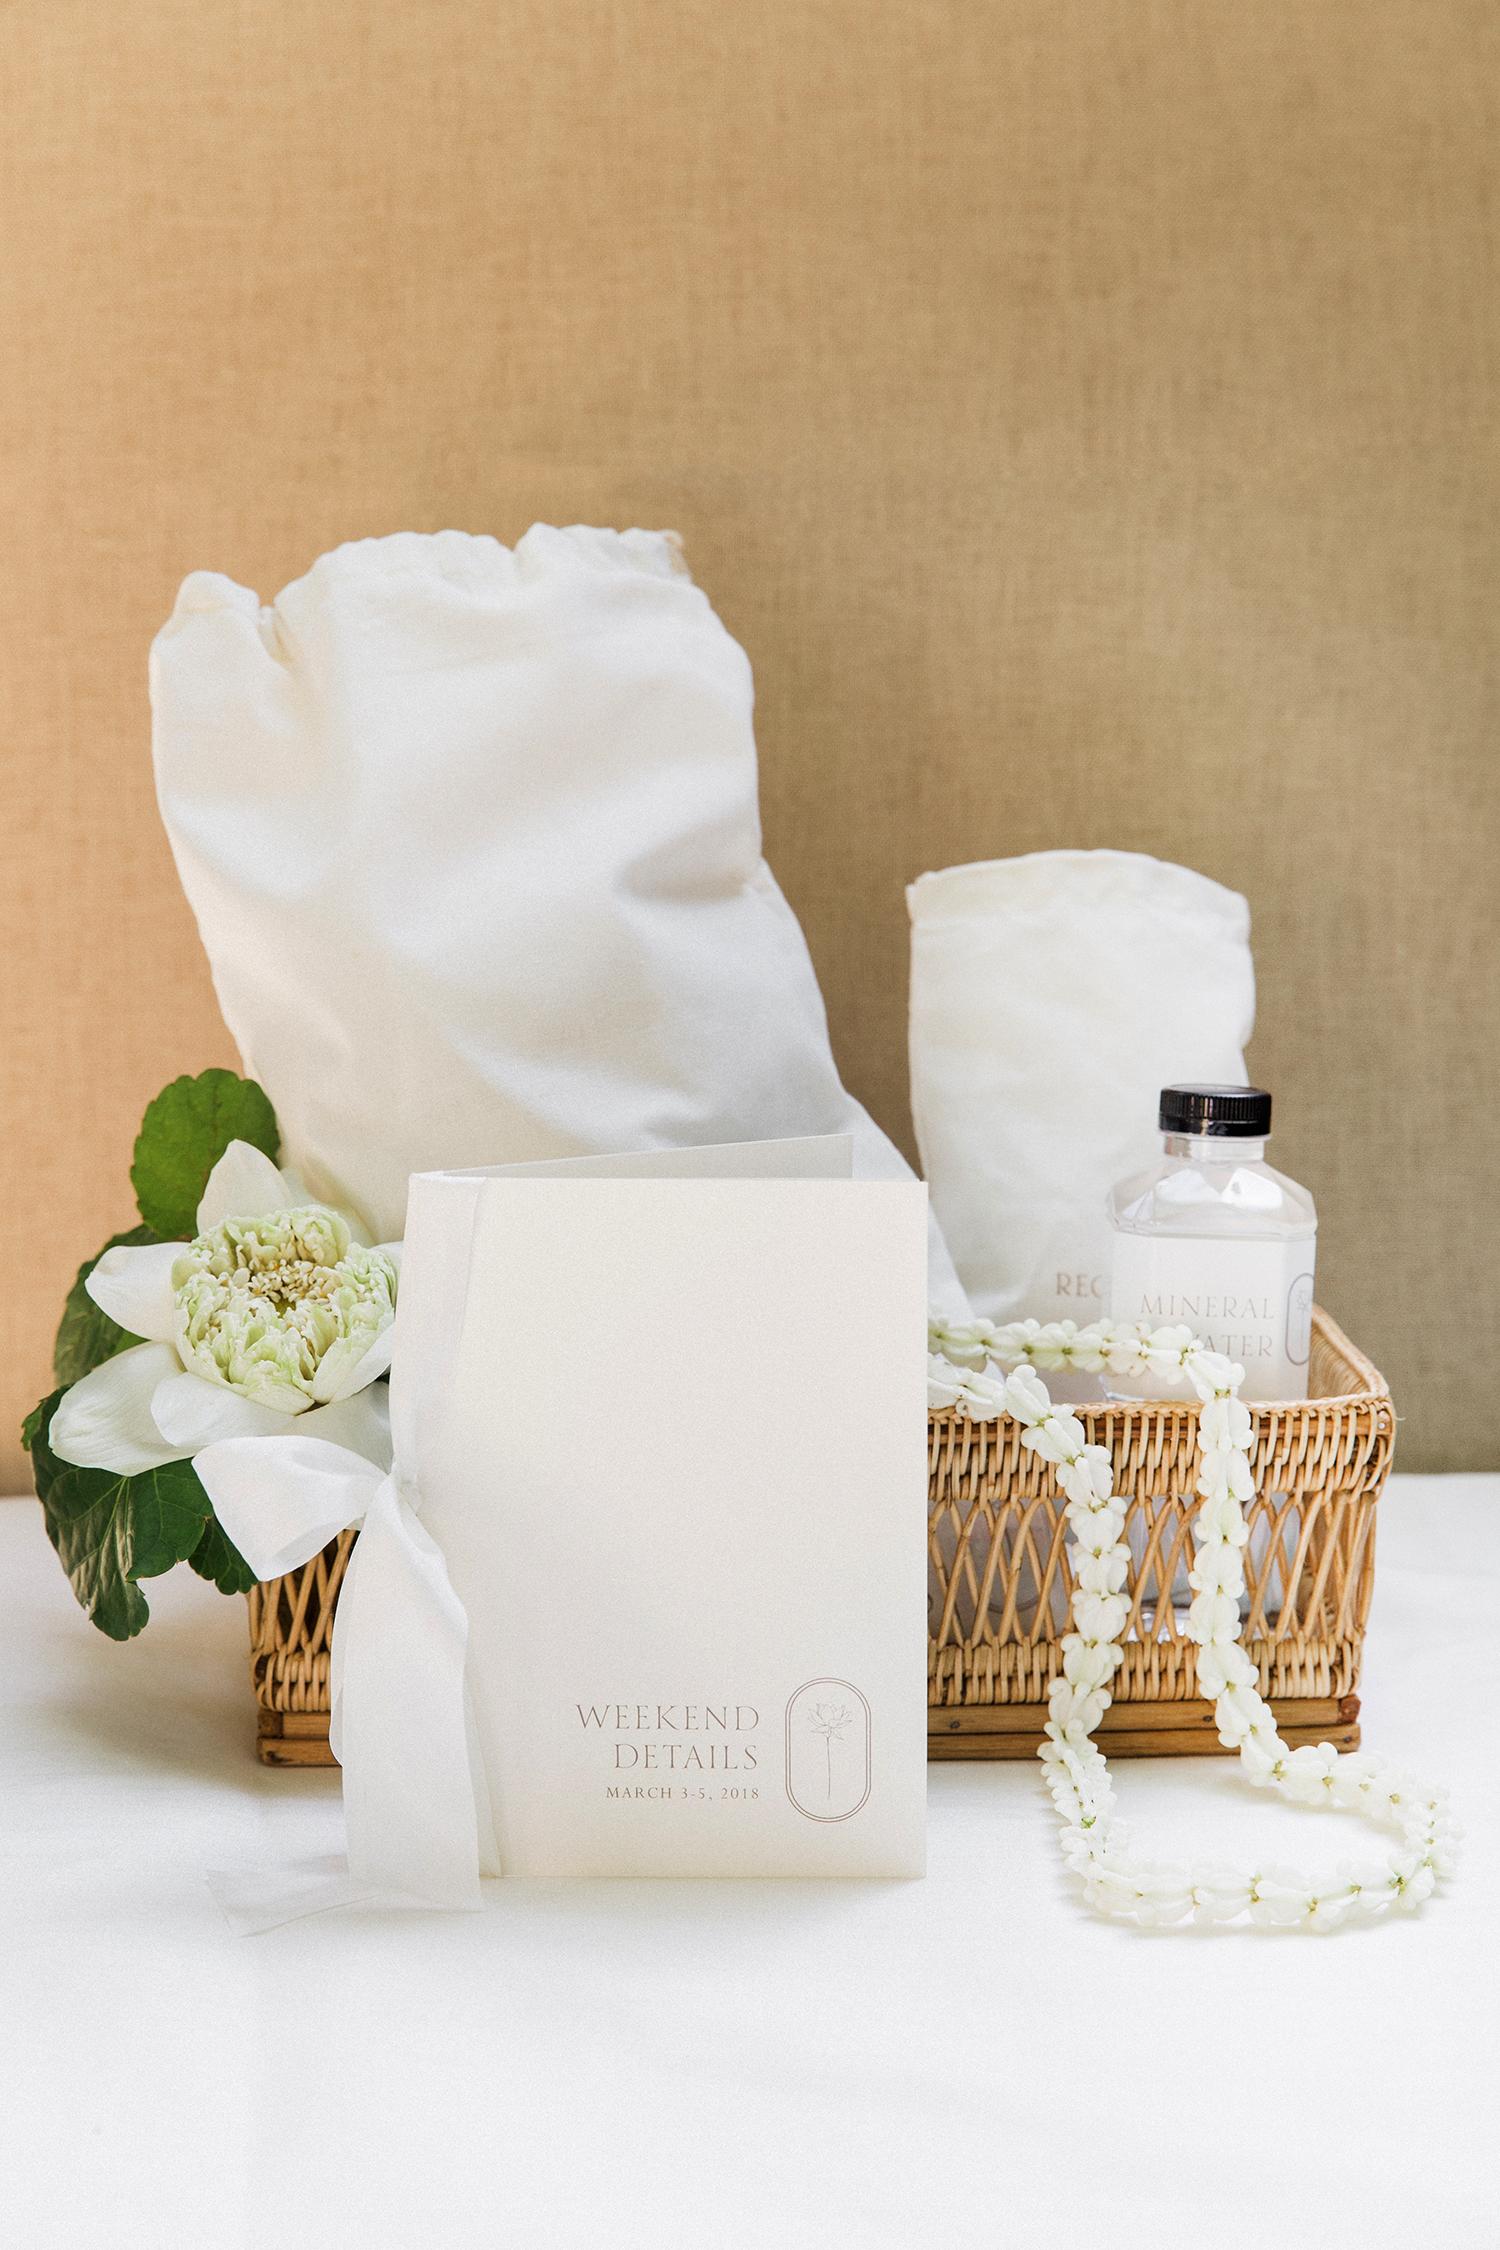 stacy brad wedding thailand welcome box